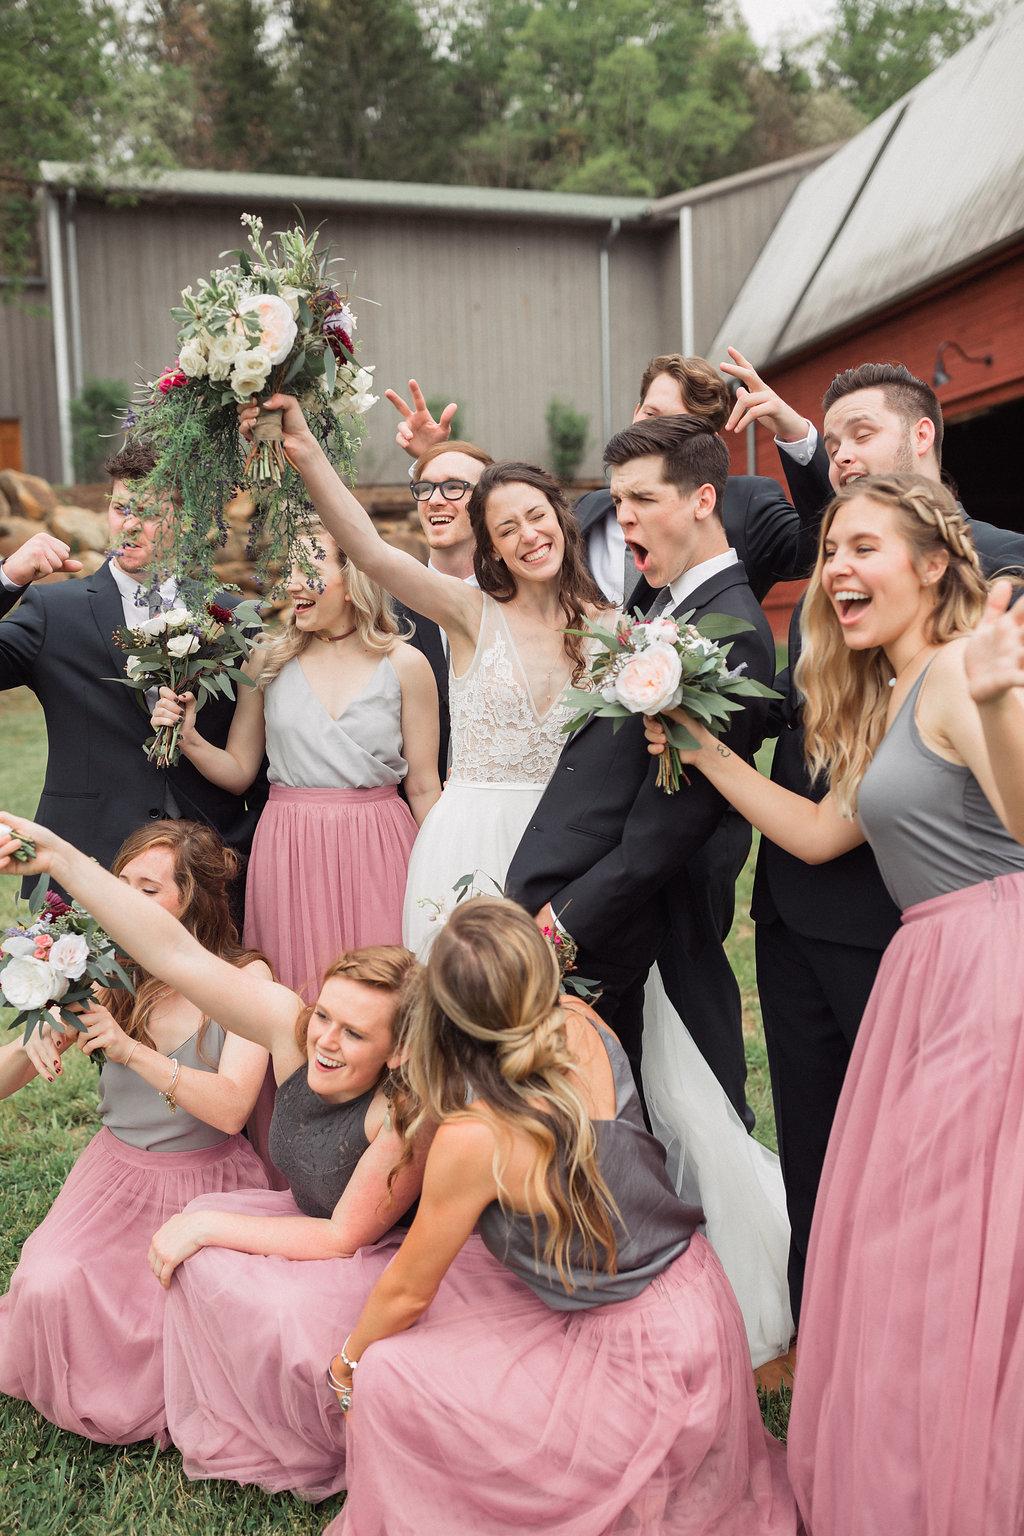 Honeysuckle-Hill-Weddings-Mallory-Patrick-78.jpg